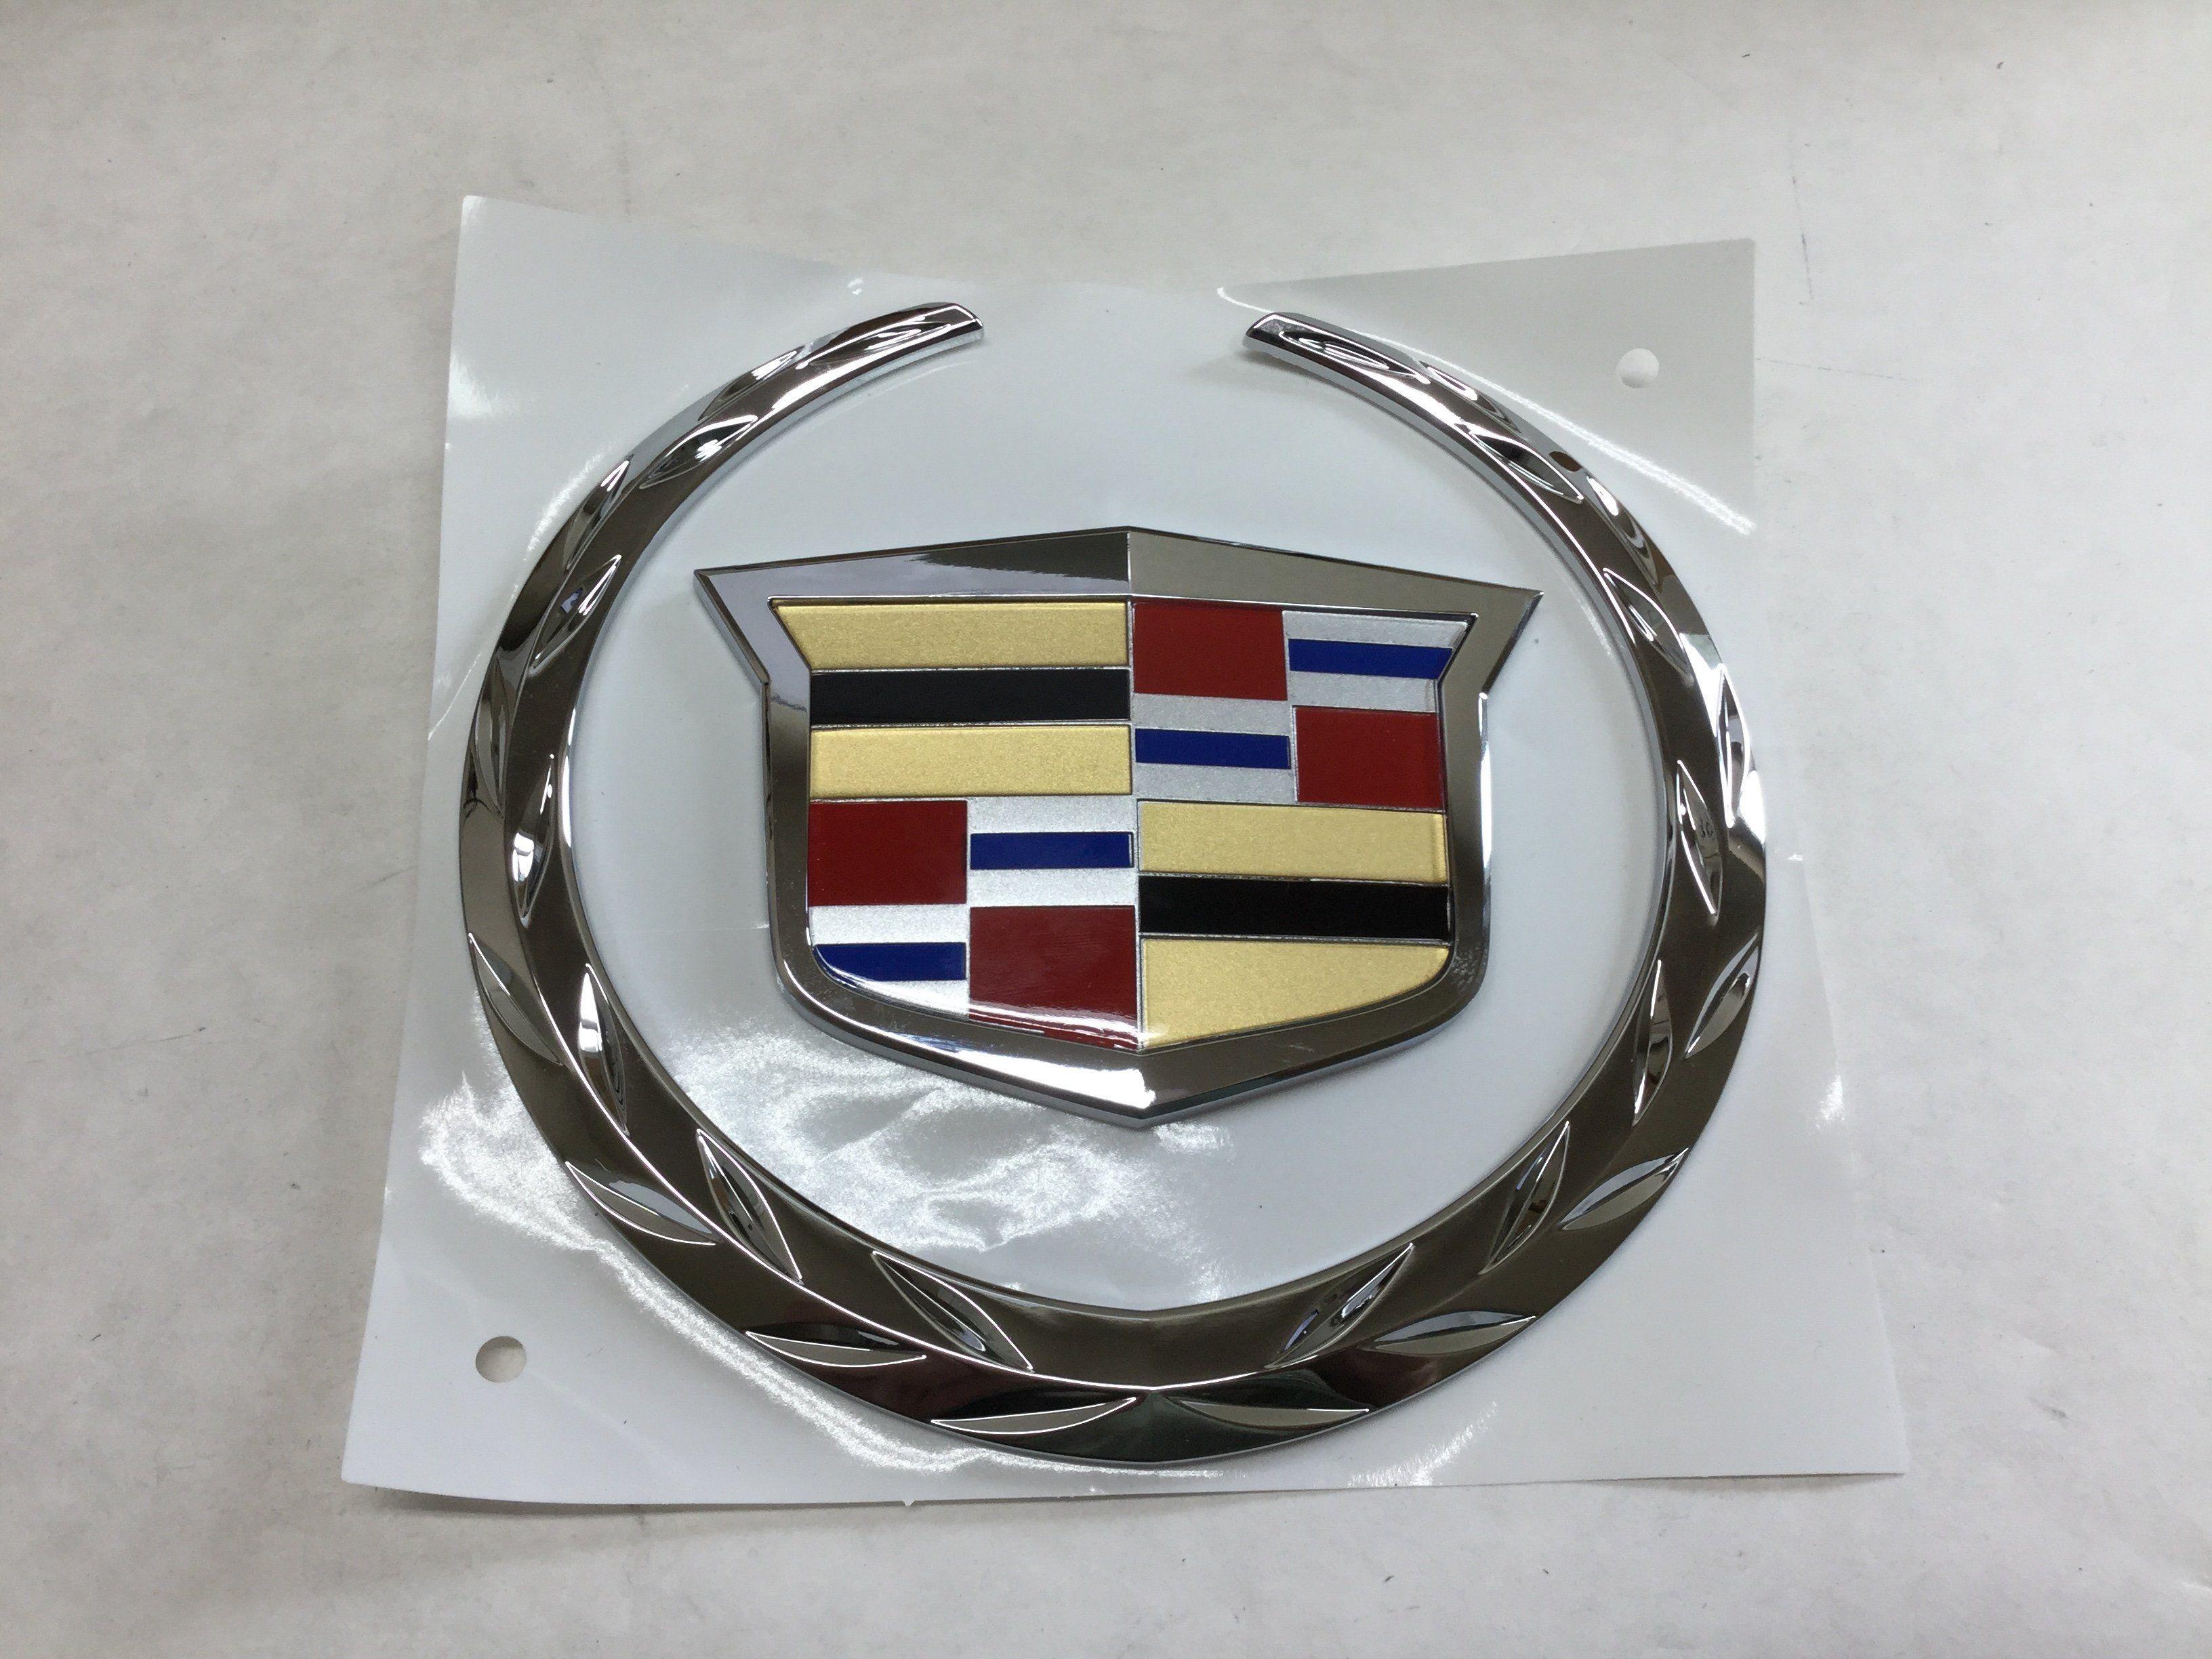 New 2007 2014 Cadillac Escalade Grille Emblem Wreath Crest Chrome